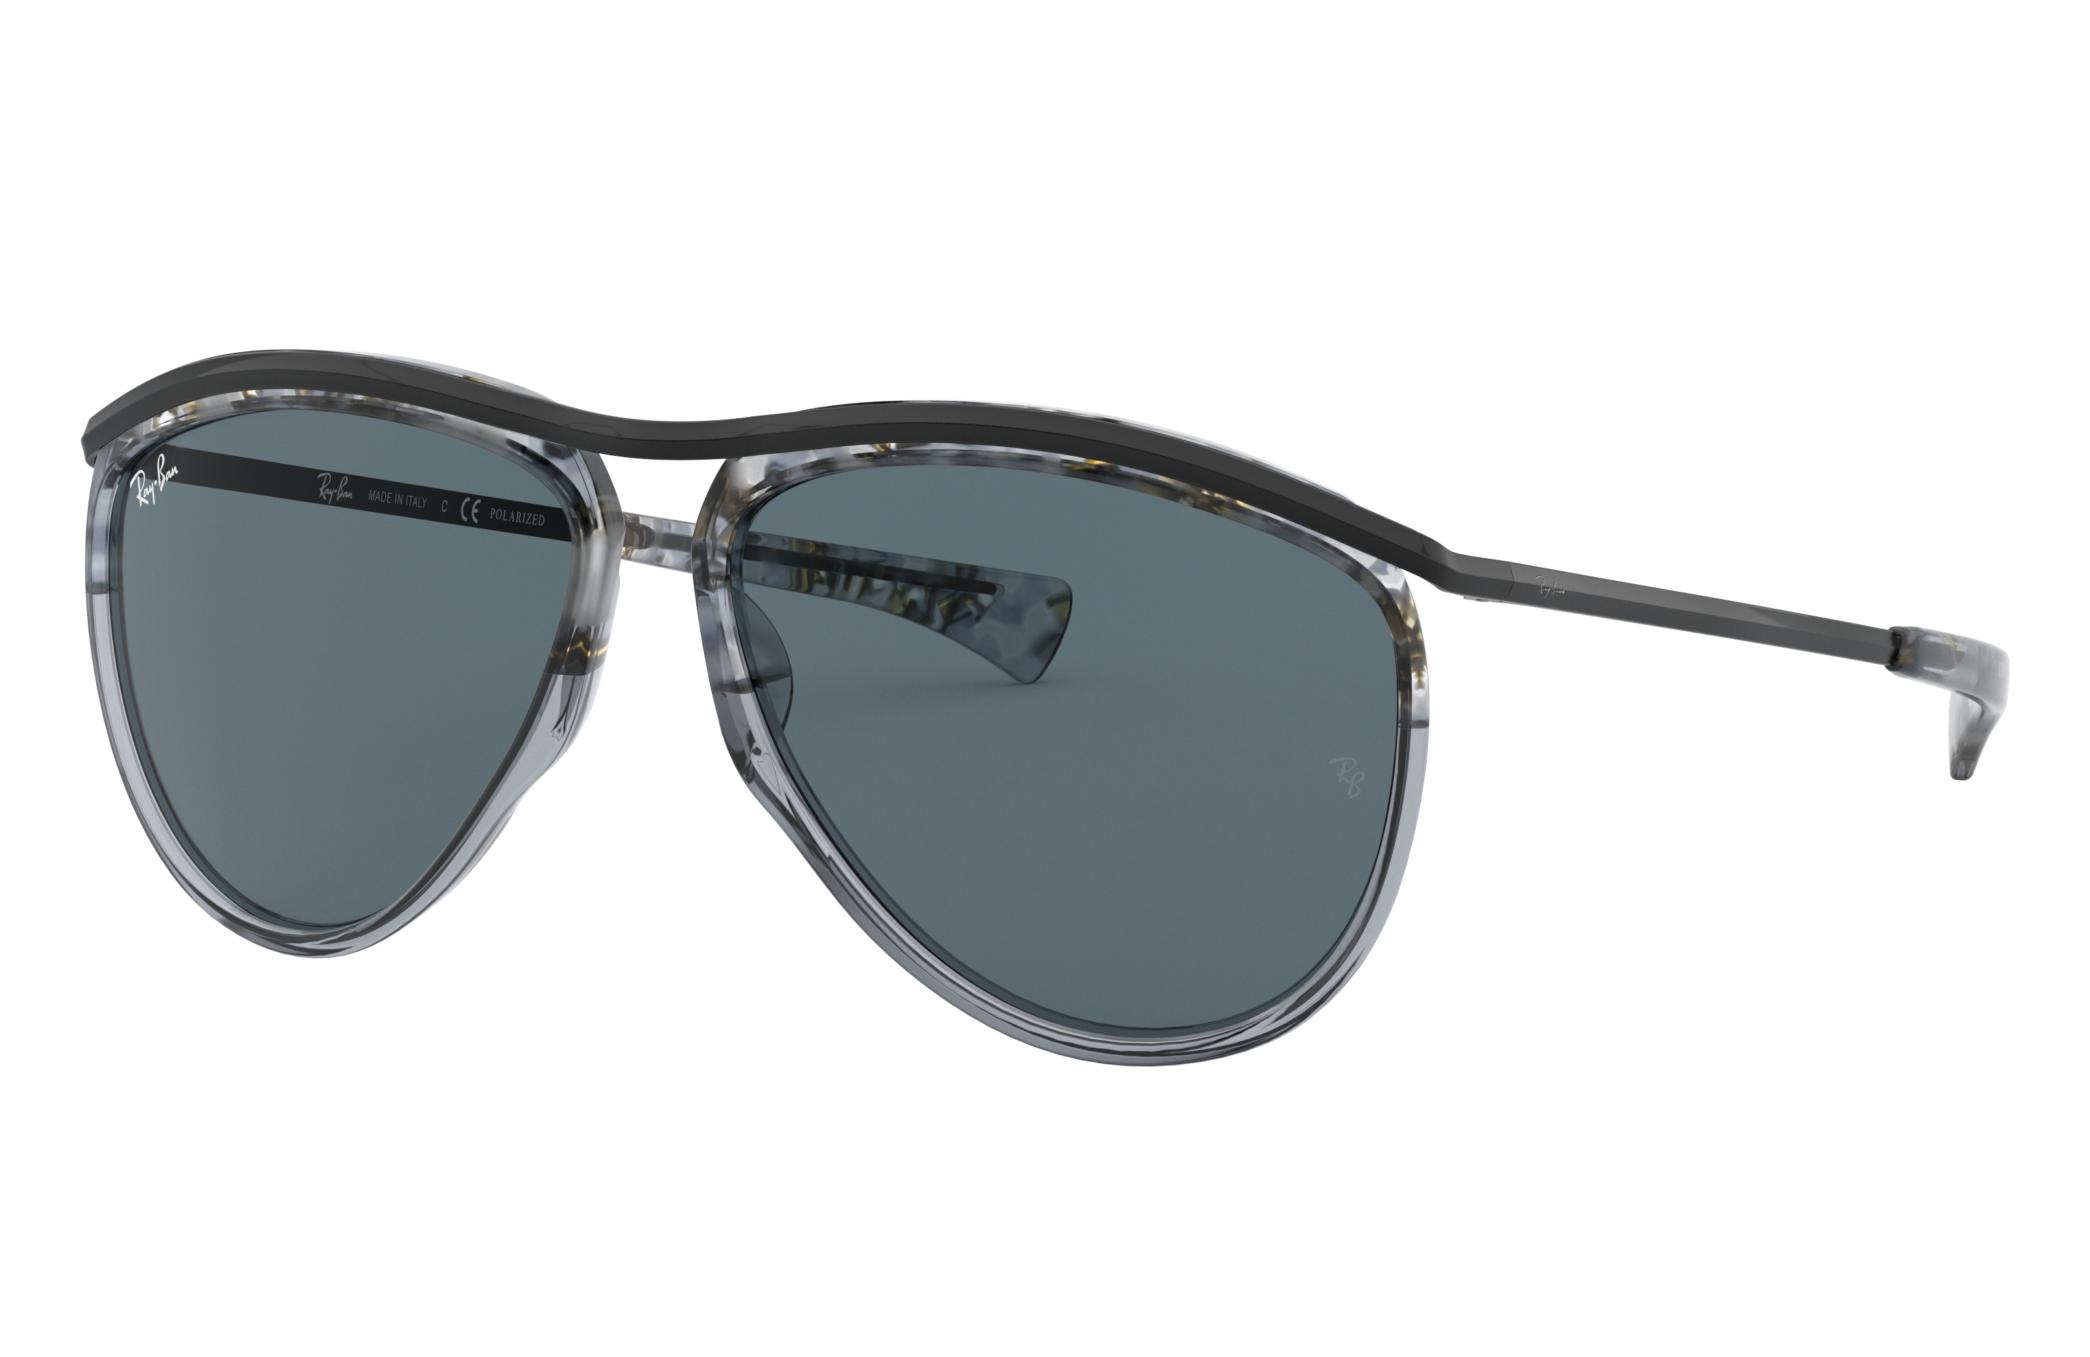 Ray-Ban Aviator Olympian Black, Blue Lenses - RB2219